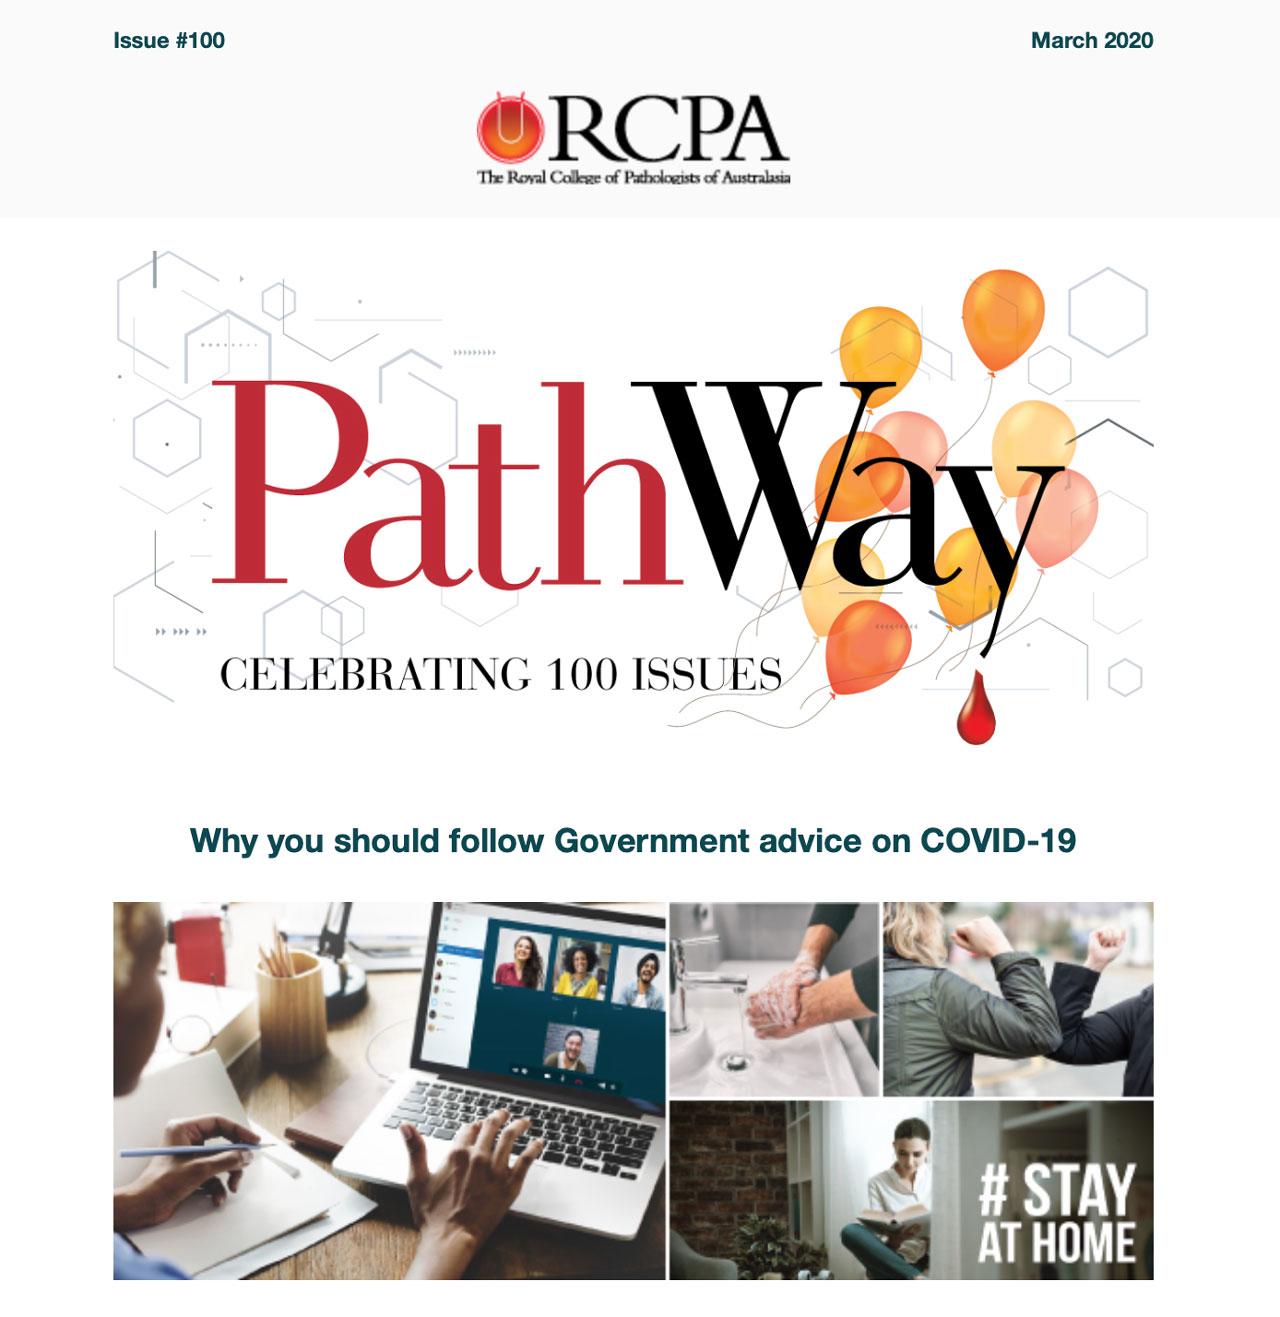 RCPA Pathway